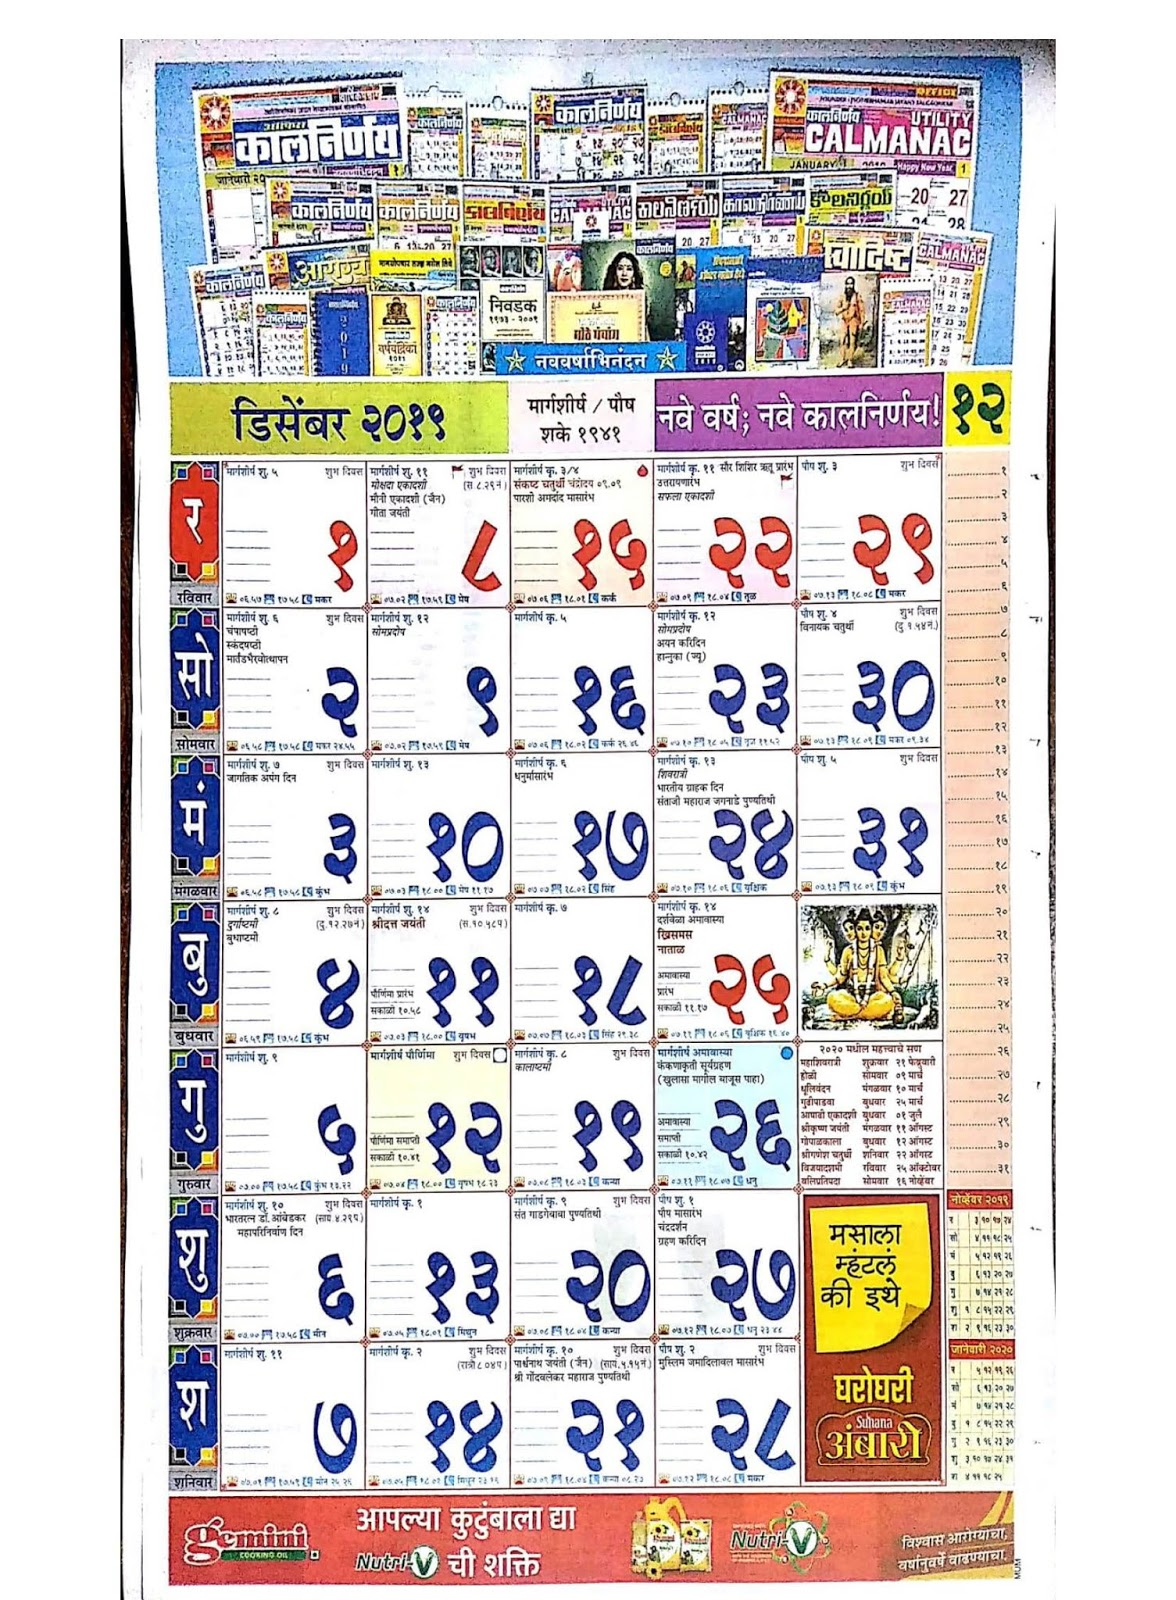 Calendar Zimbabwe Pdf Download : मराठी कालनिर्णय कॅलेंडर २०१९ marathi kalnirnay calendar